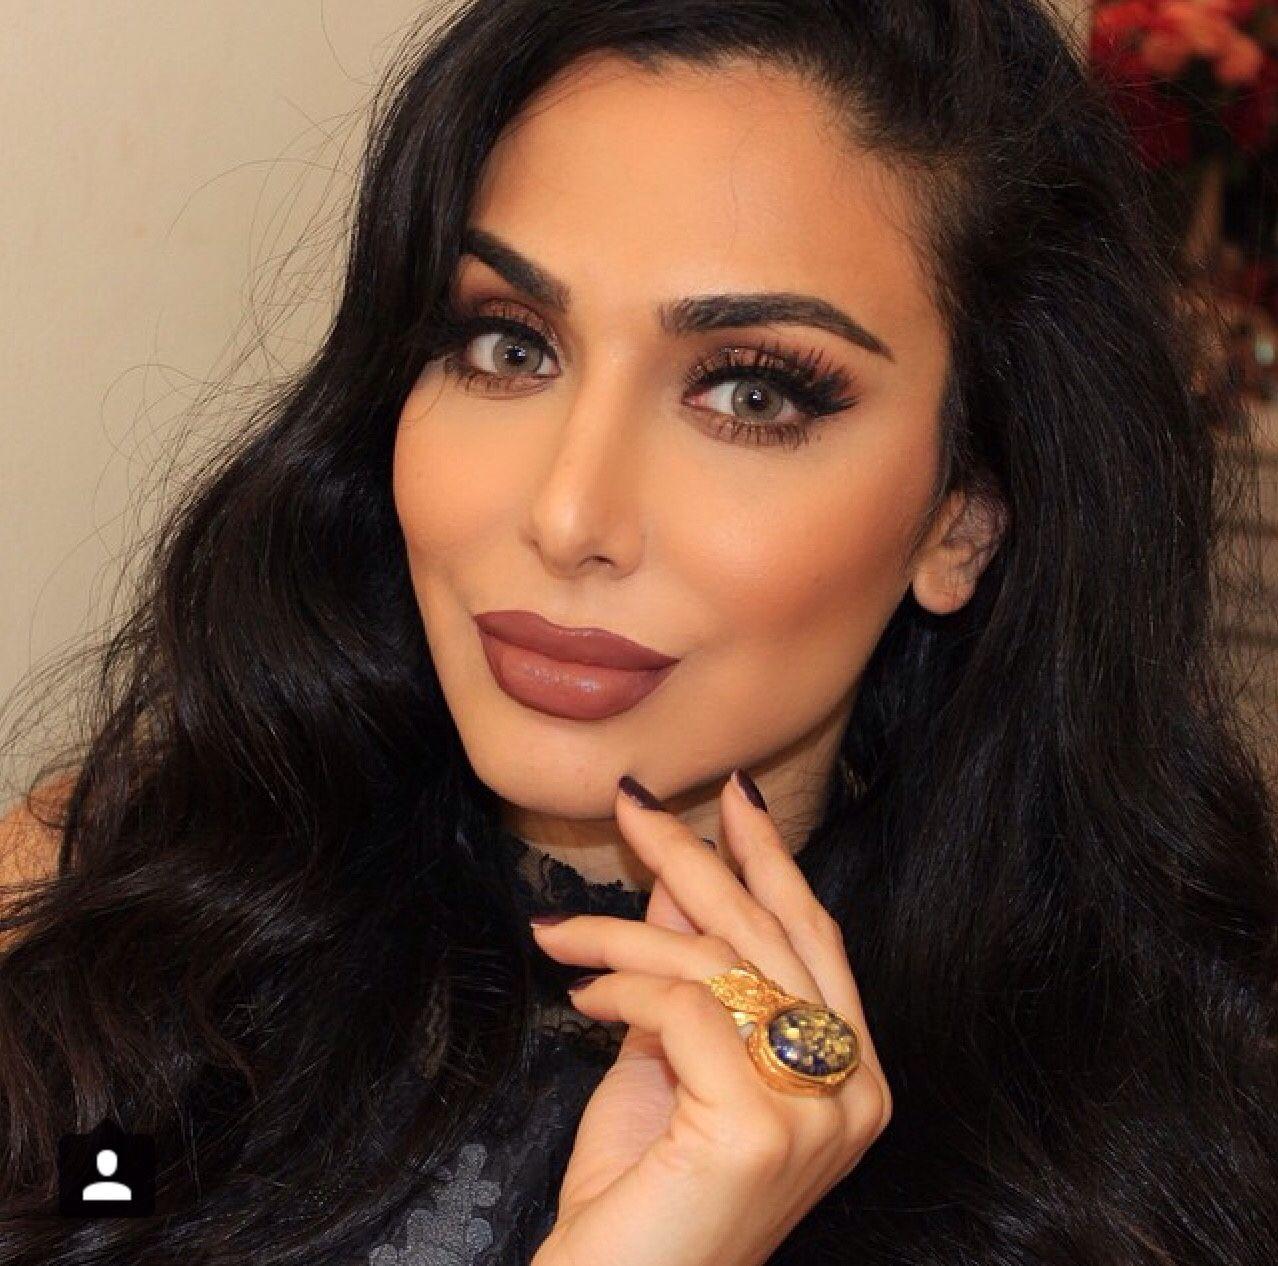 "persephonetheteenagewitch: ""Okay but like, Huda Kattan is so beautiful. She looks like a cross between Kim K and Angelina Jolie. Also, can we appreciate an Arab (Iraqi) beauty blogger? """